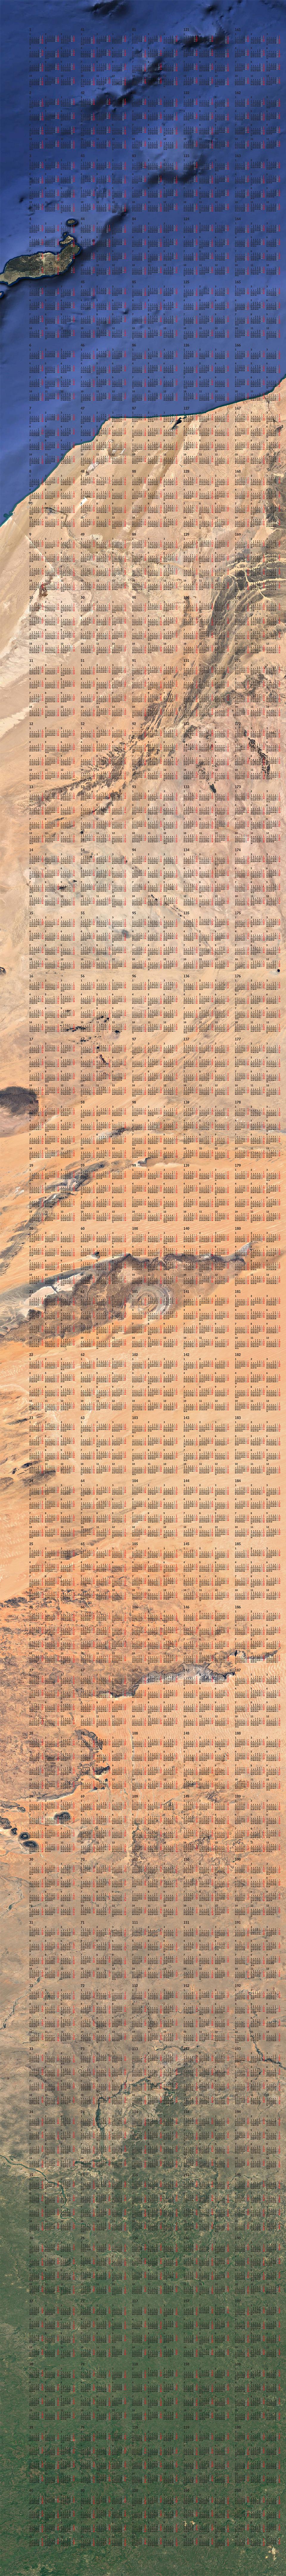 20210204_UNF0LD_CALENDAR_0001y-4000y_Sahara_Desert_2980x1480mm_Left.jpg